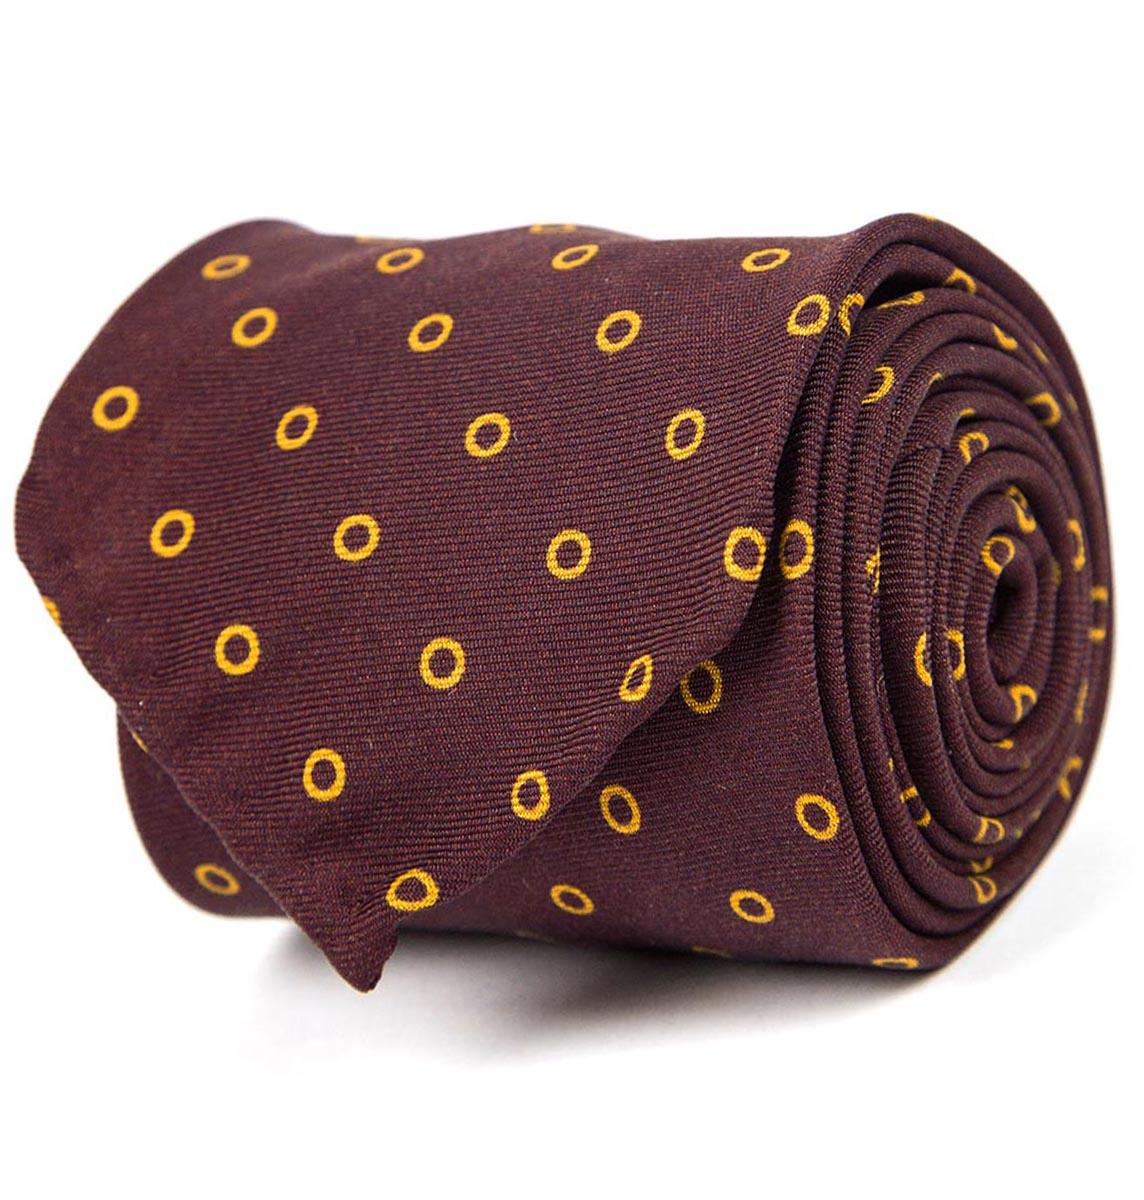 Navy And Gold Silk Tie Rubinacci 9dlUB